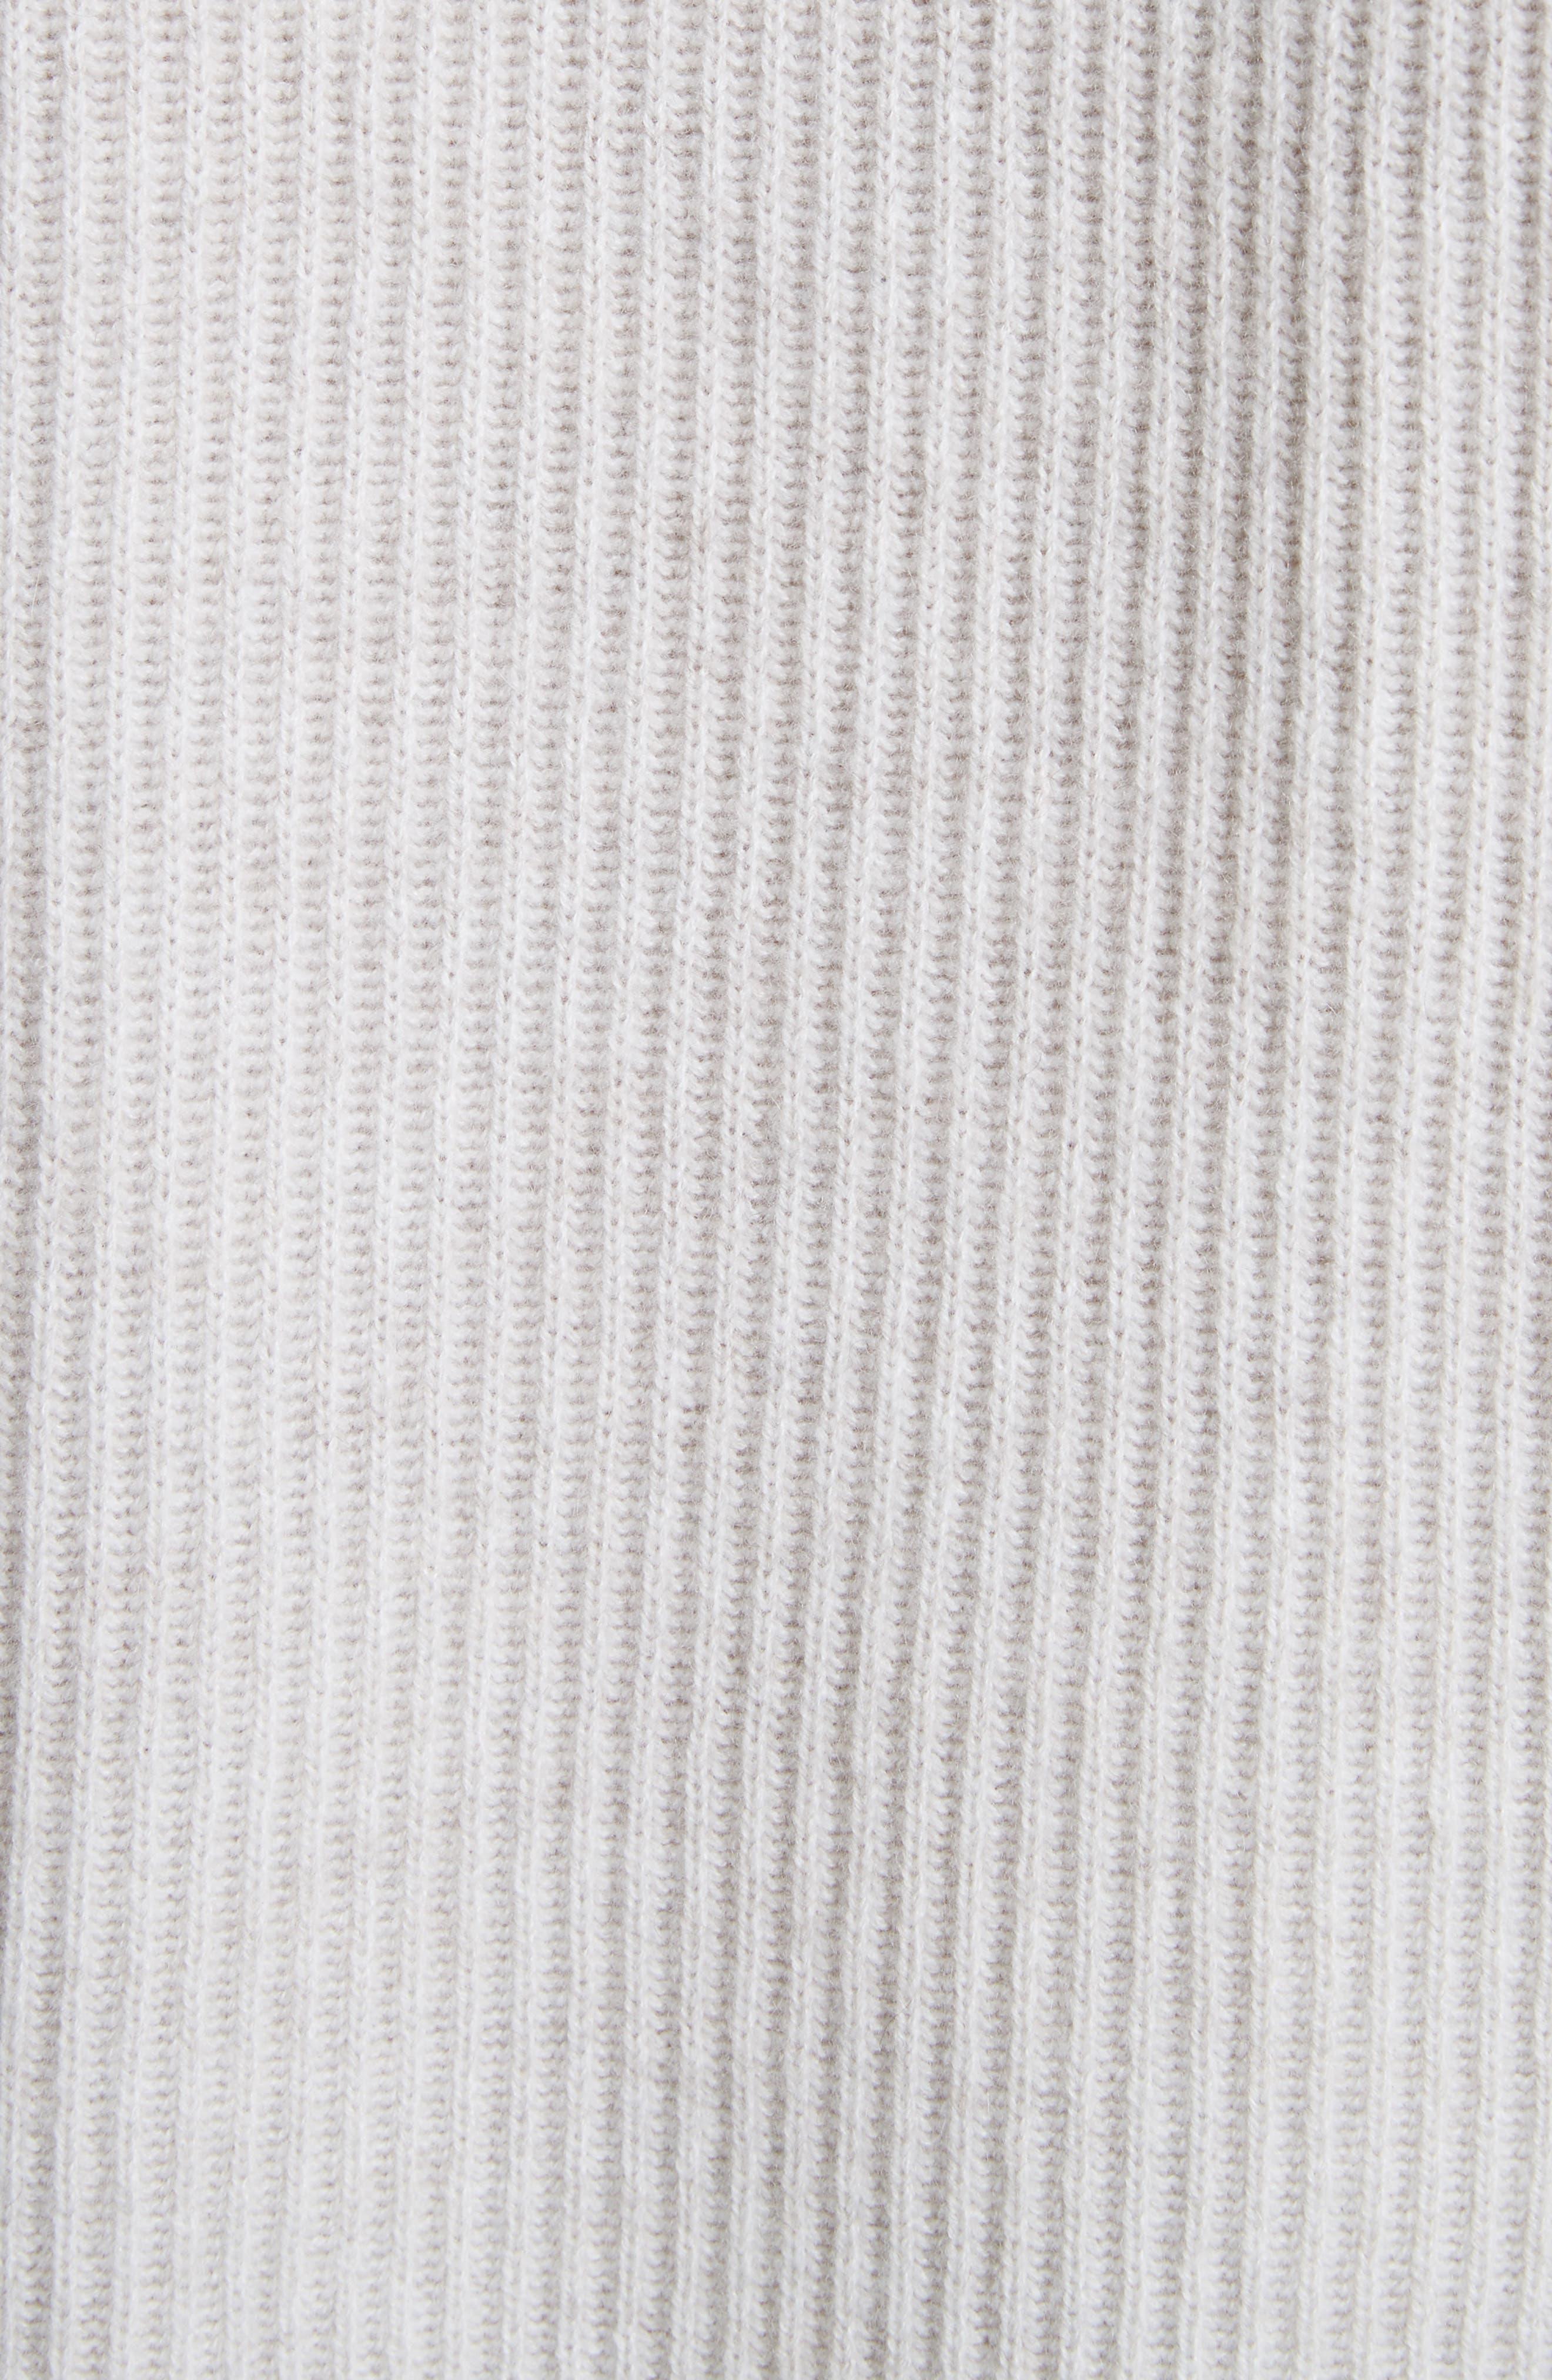 Diagonal Rib Wool & Cashmere Sweater,                             Alternate thumbnail 14, color,